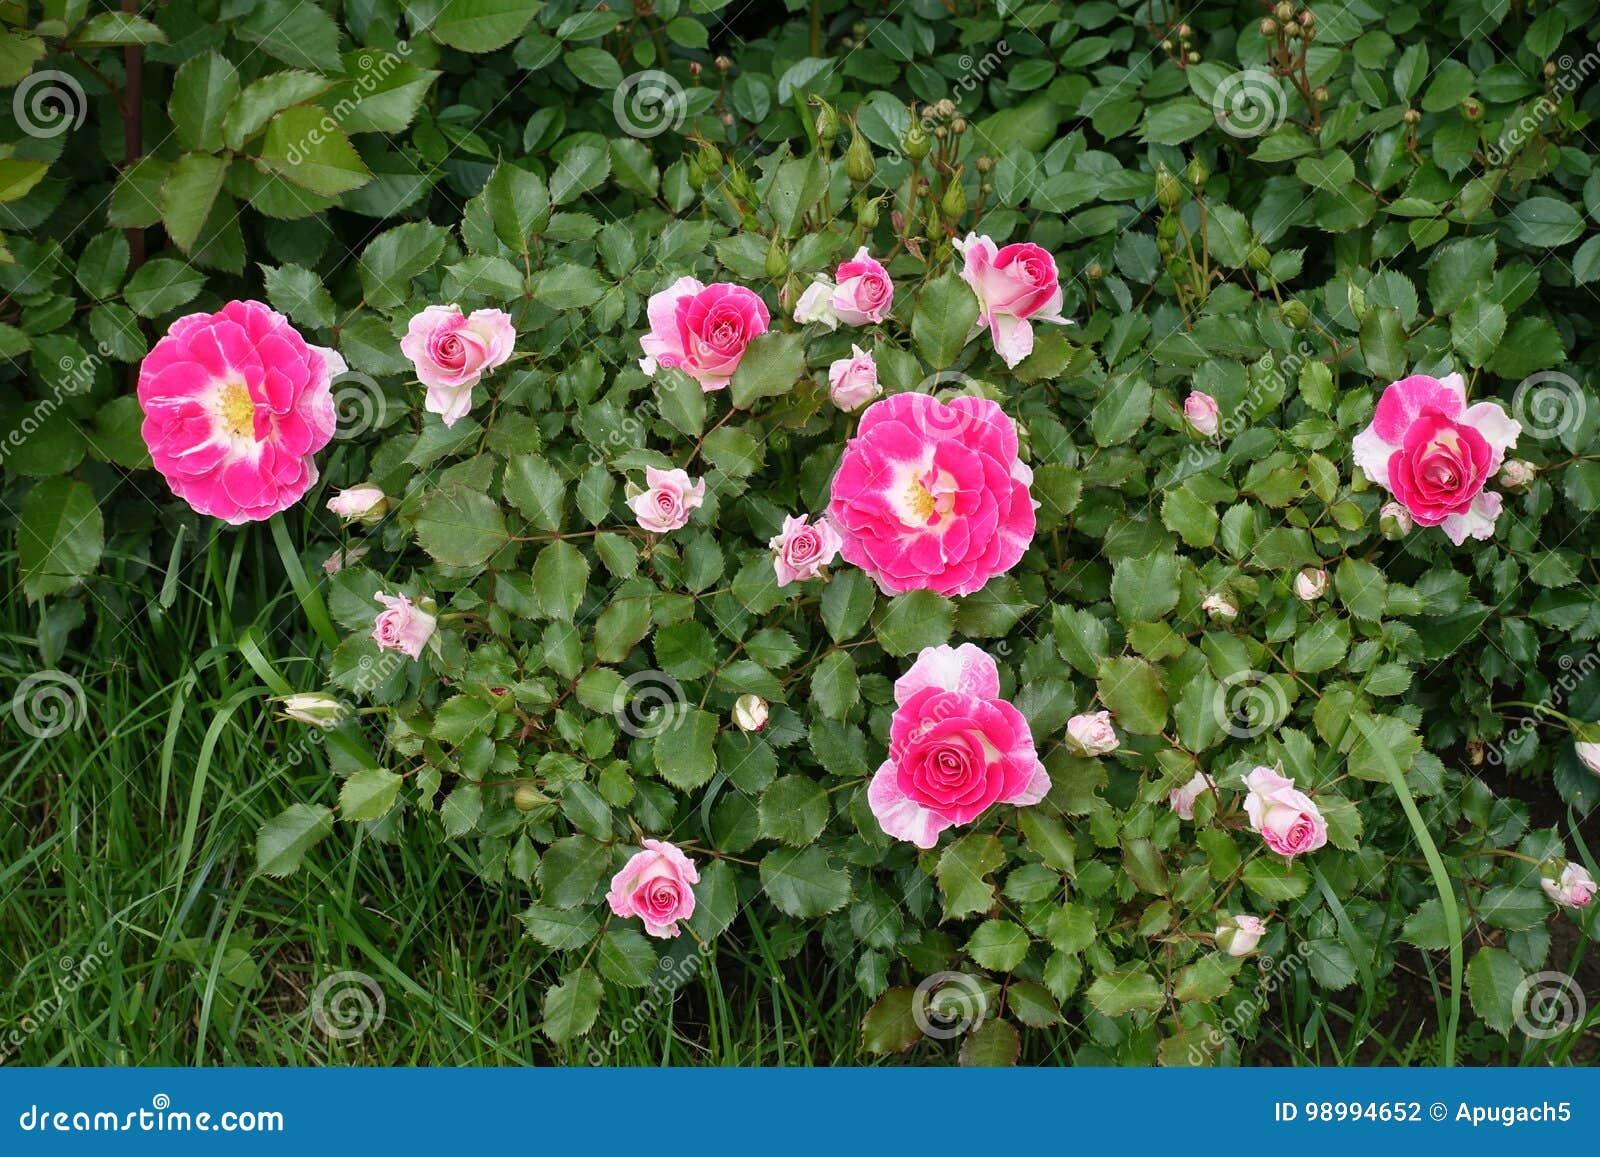 Deep pink flowers of rose in the garden stock photo image of download deep pink flowers of rose in the garden stock photo image of blossom mightylinksfo